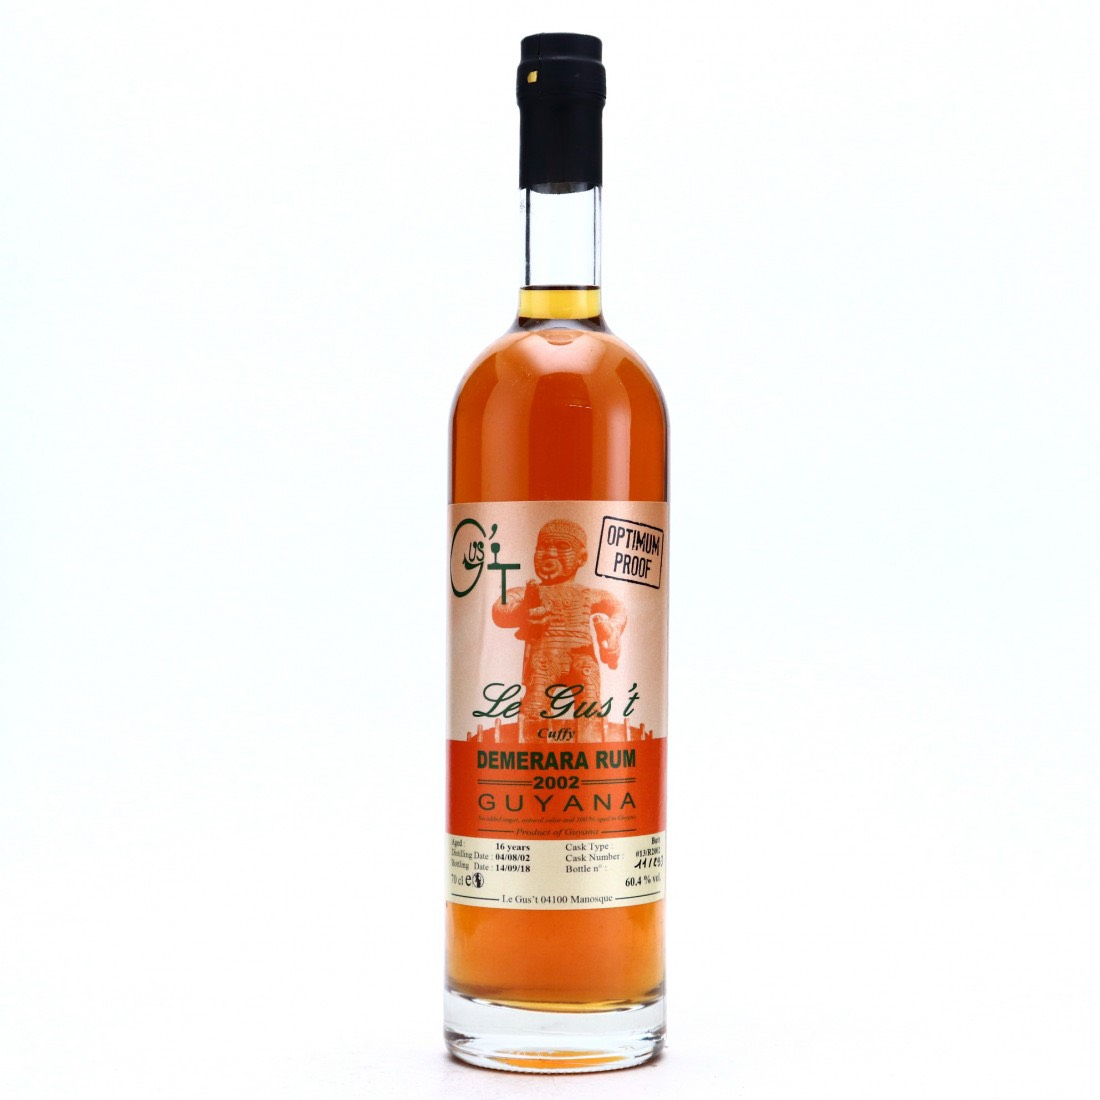 Bottle image of Demerara Rum Cuffy Optimum Proof